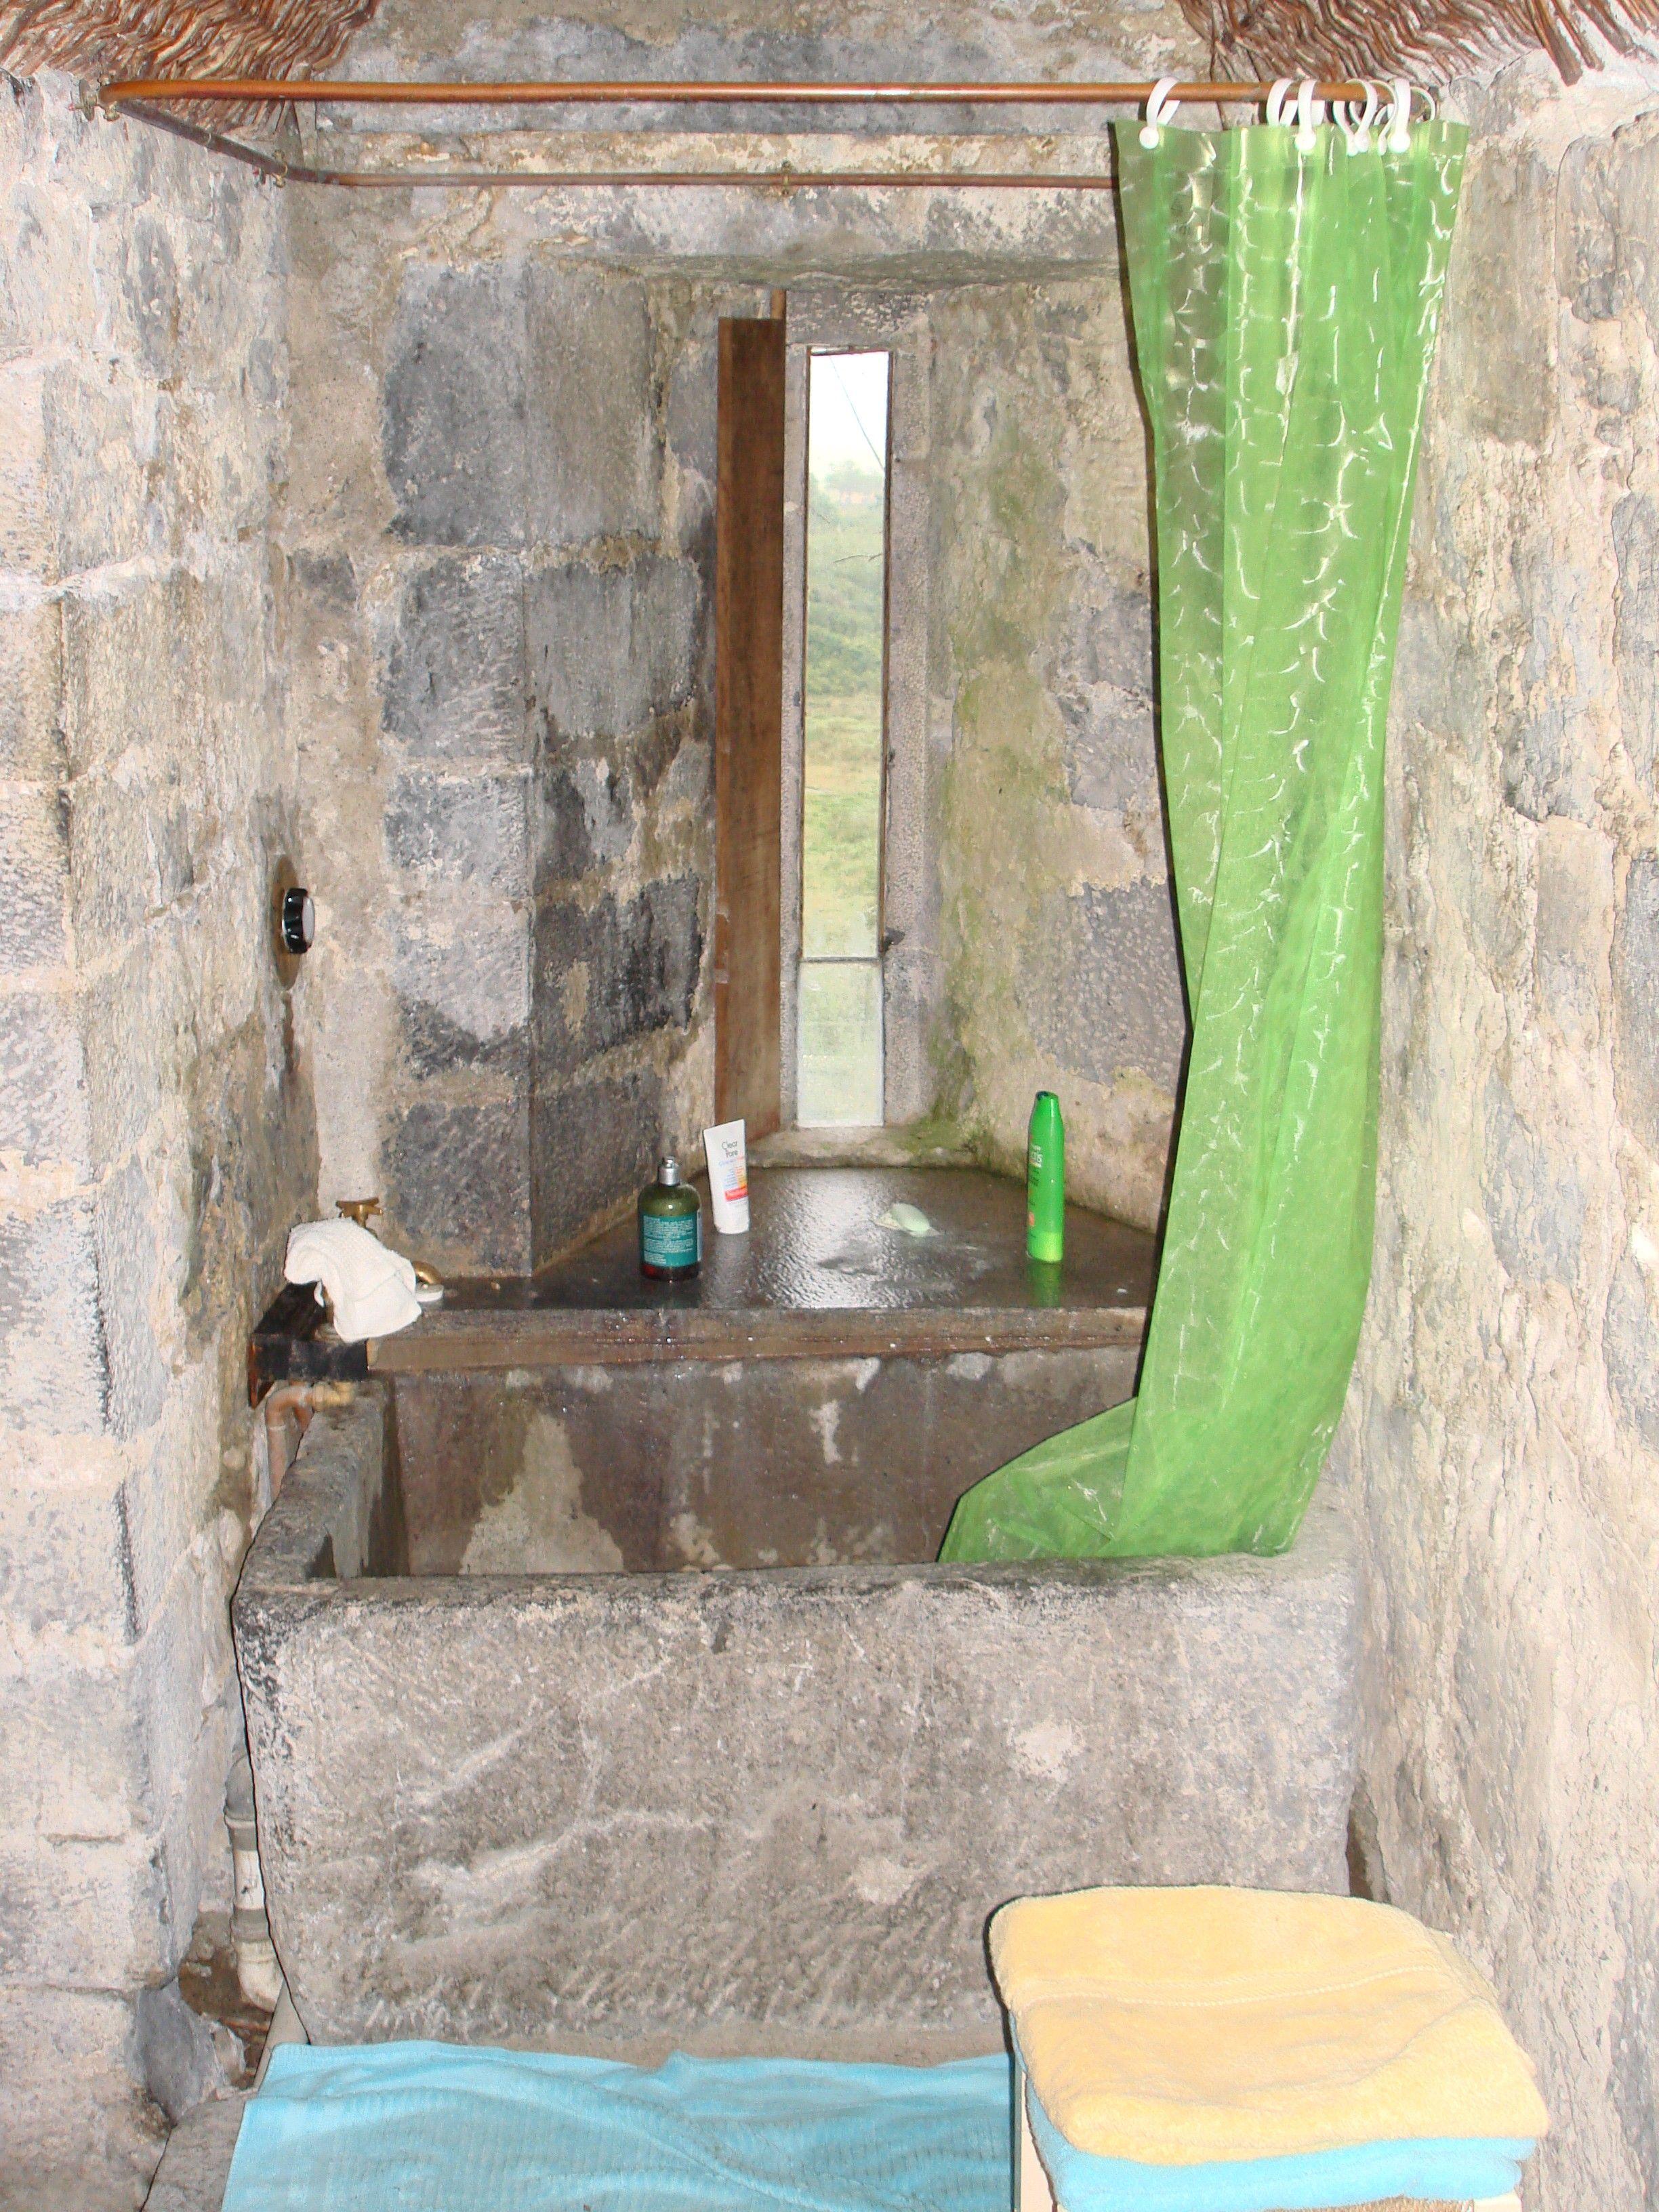 Inside medieval castles ballyportry castle bathroom 3 for Bathrooms in castles